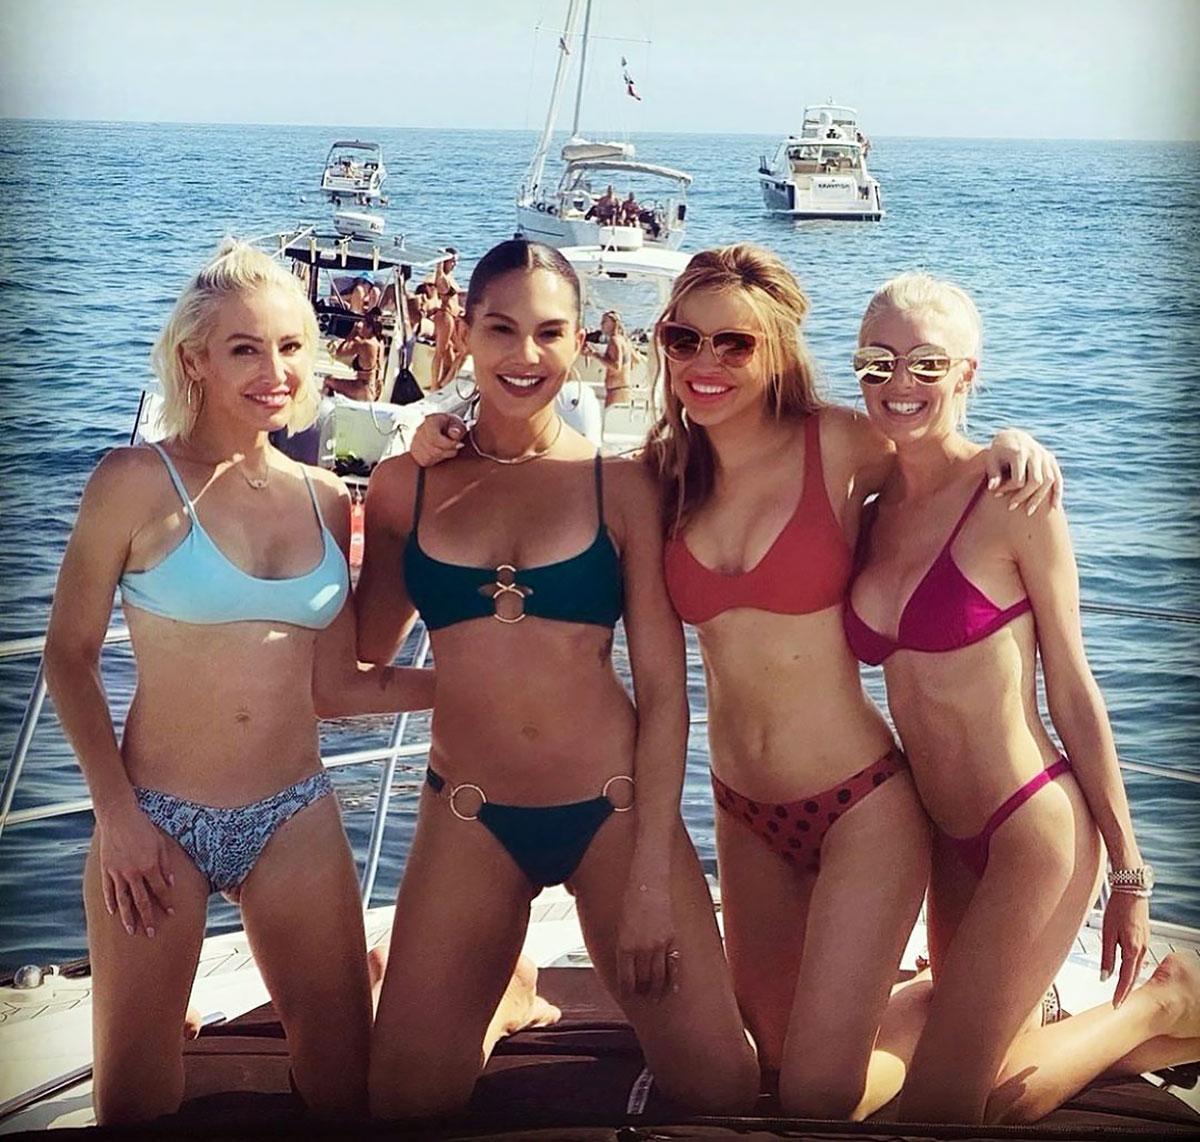 bikini beauty pic